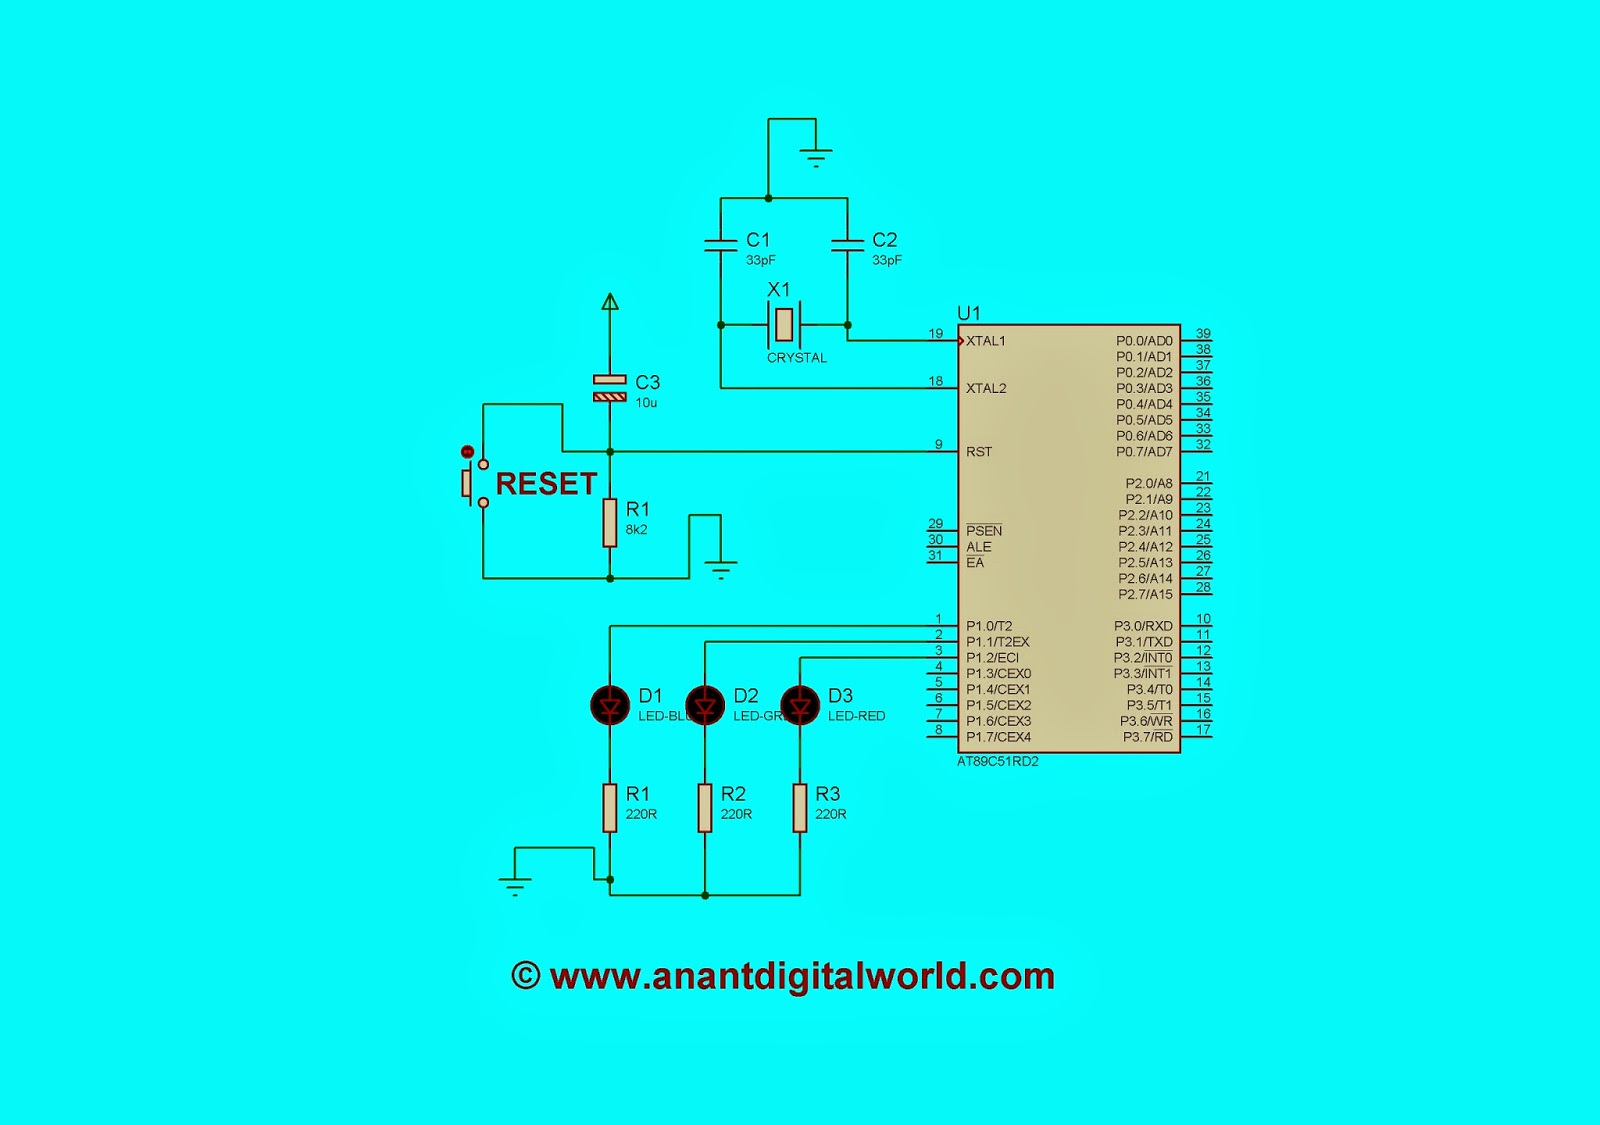 Interfacing Rgb Led 8051 Microcontroller Anant Digital World Adc To Blinking Using